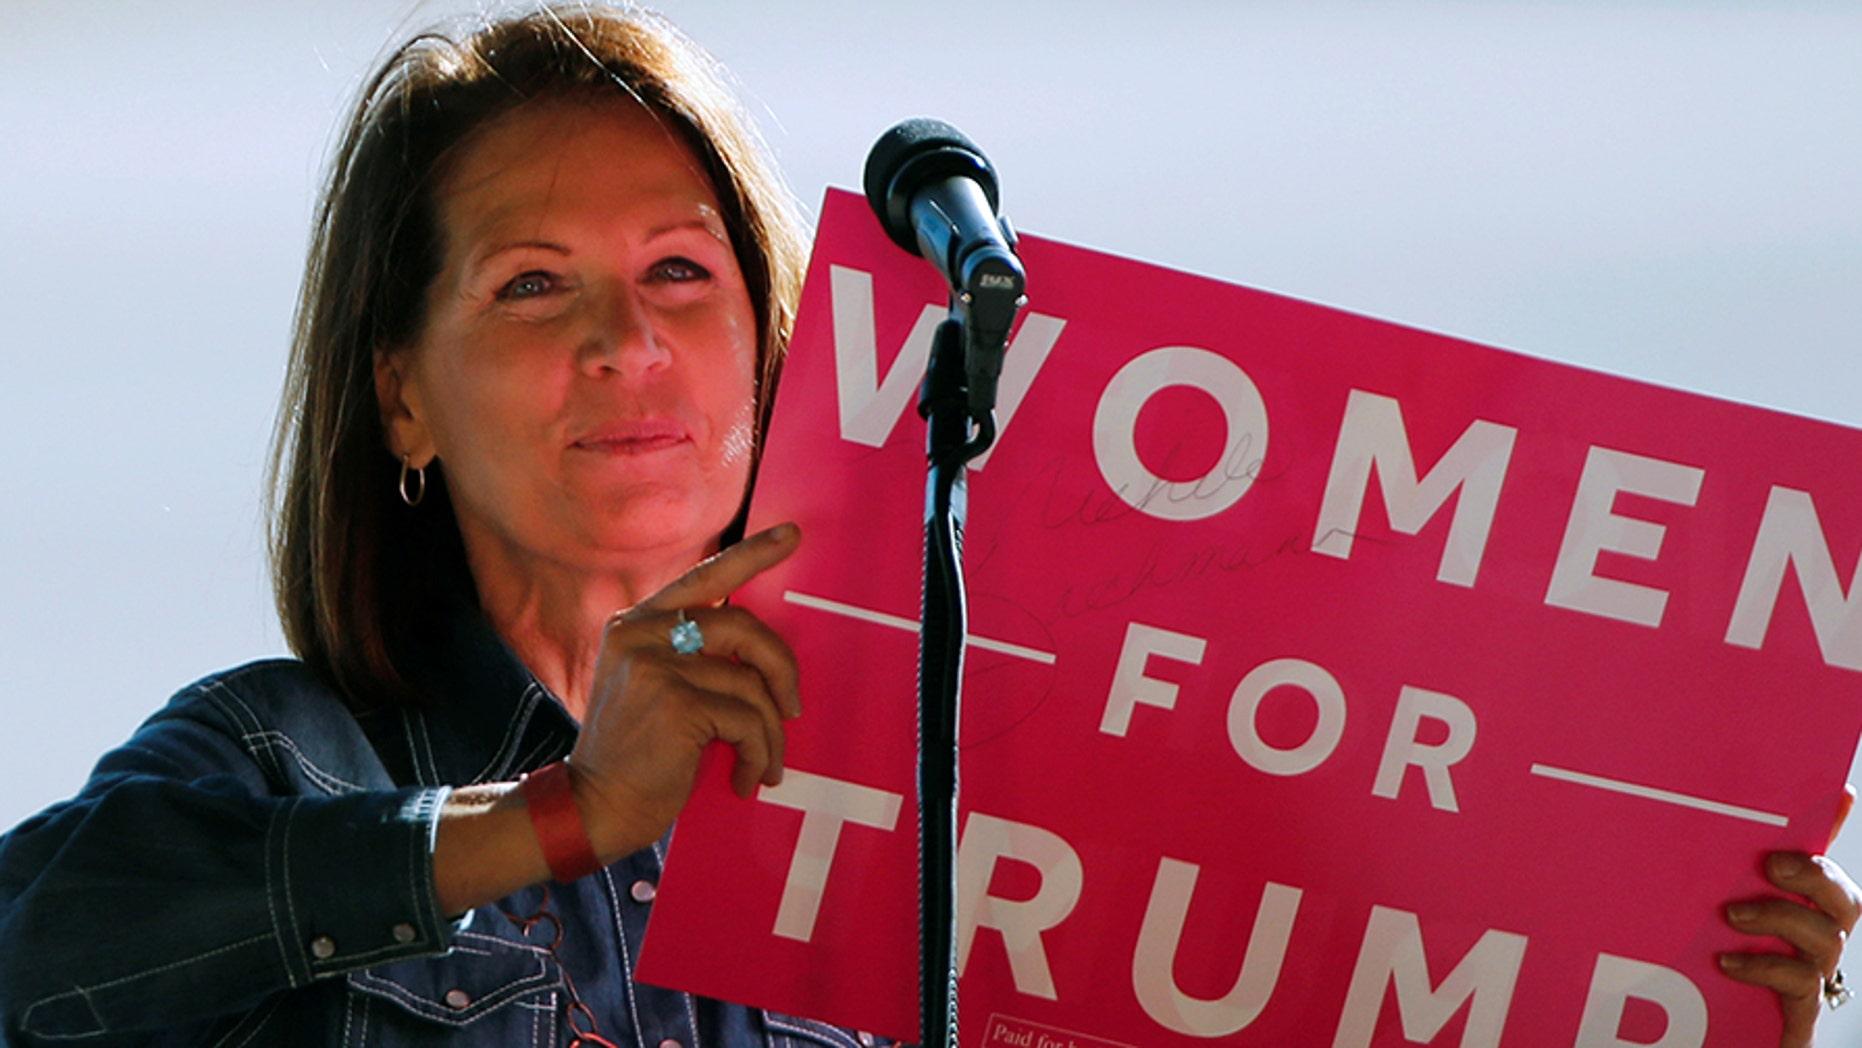 Former House Rep. Michele Bachmann said Monday that she won't run for U.S. Senate, despite previous suggestions she might run for former Sen. Al Franken's seat.